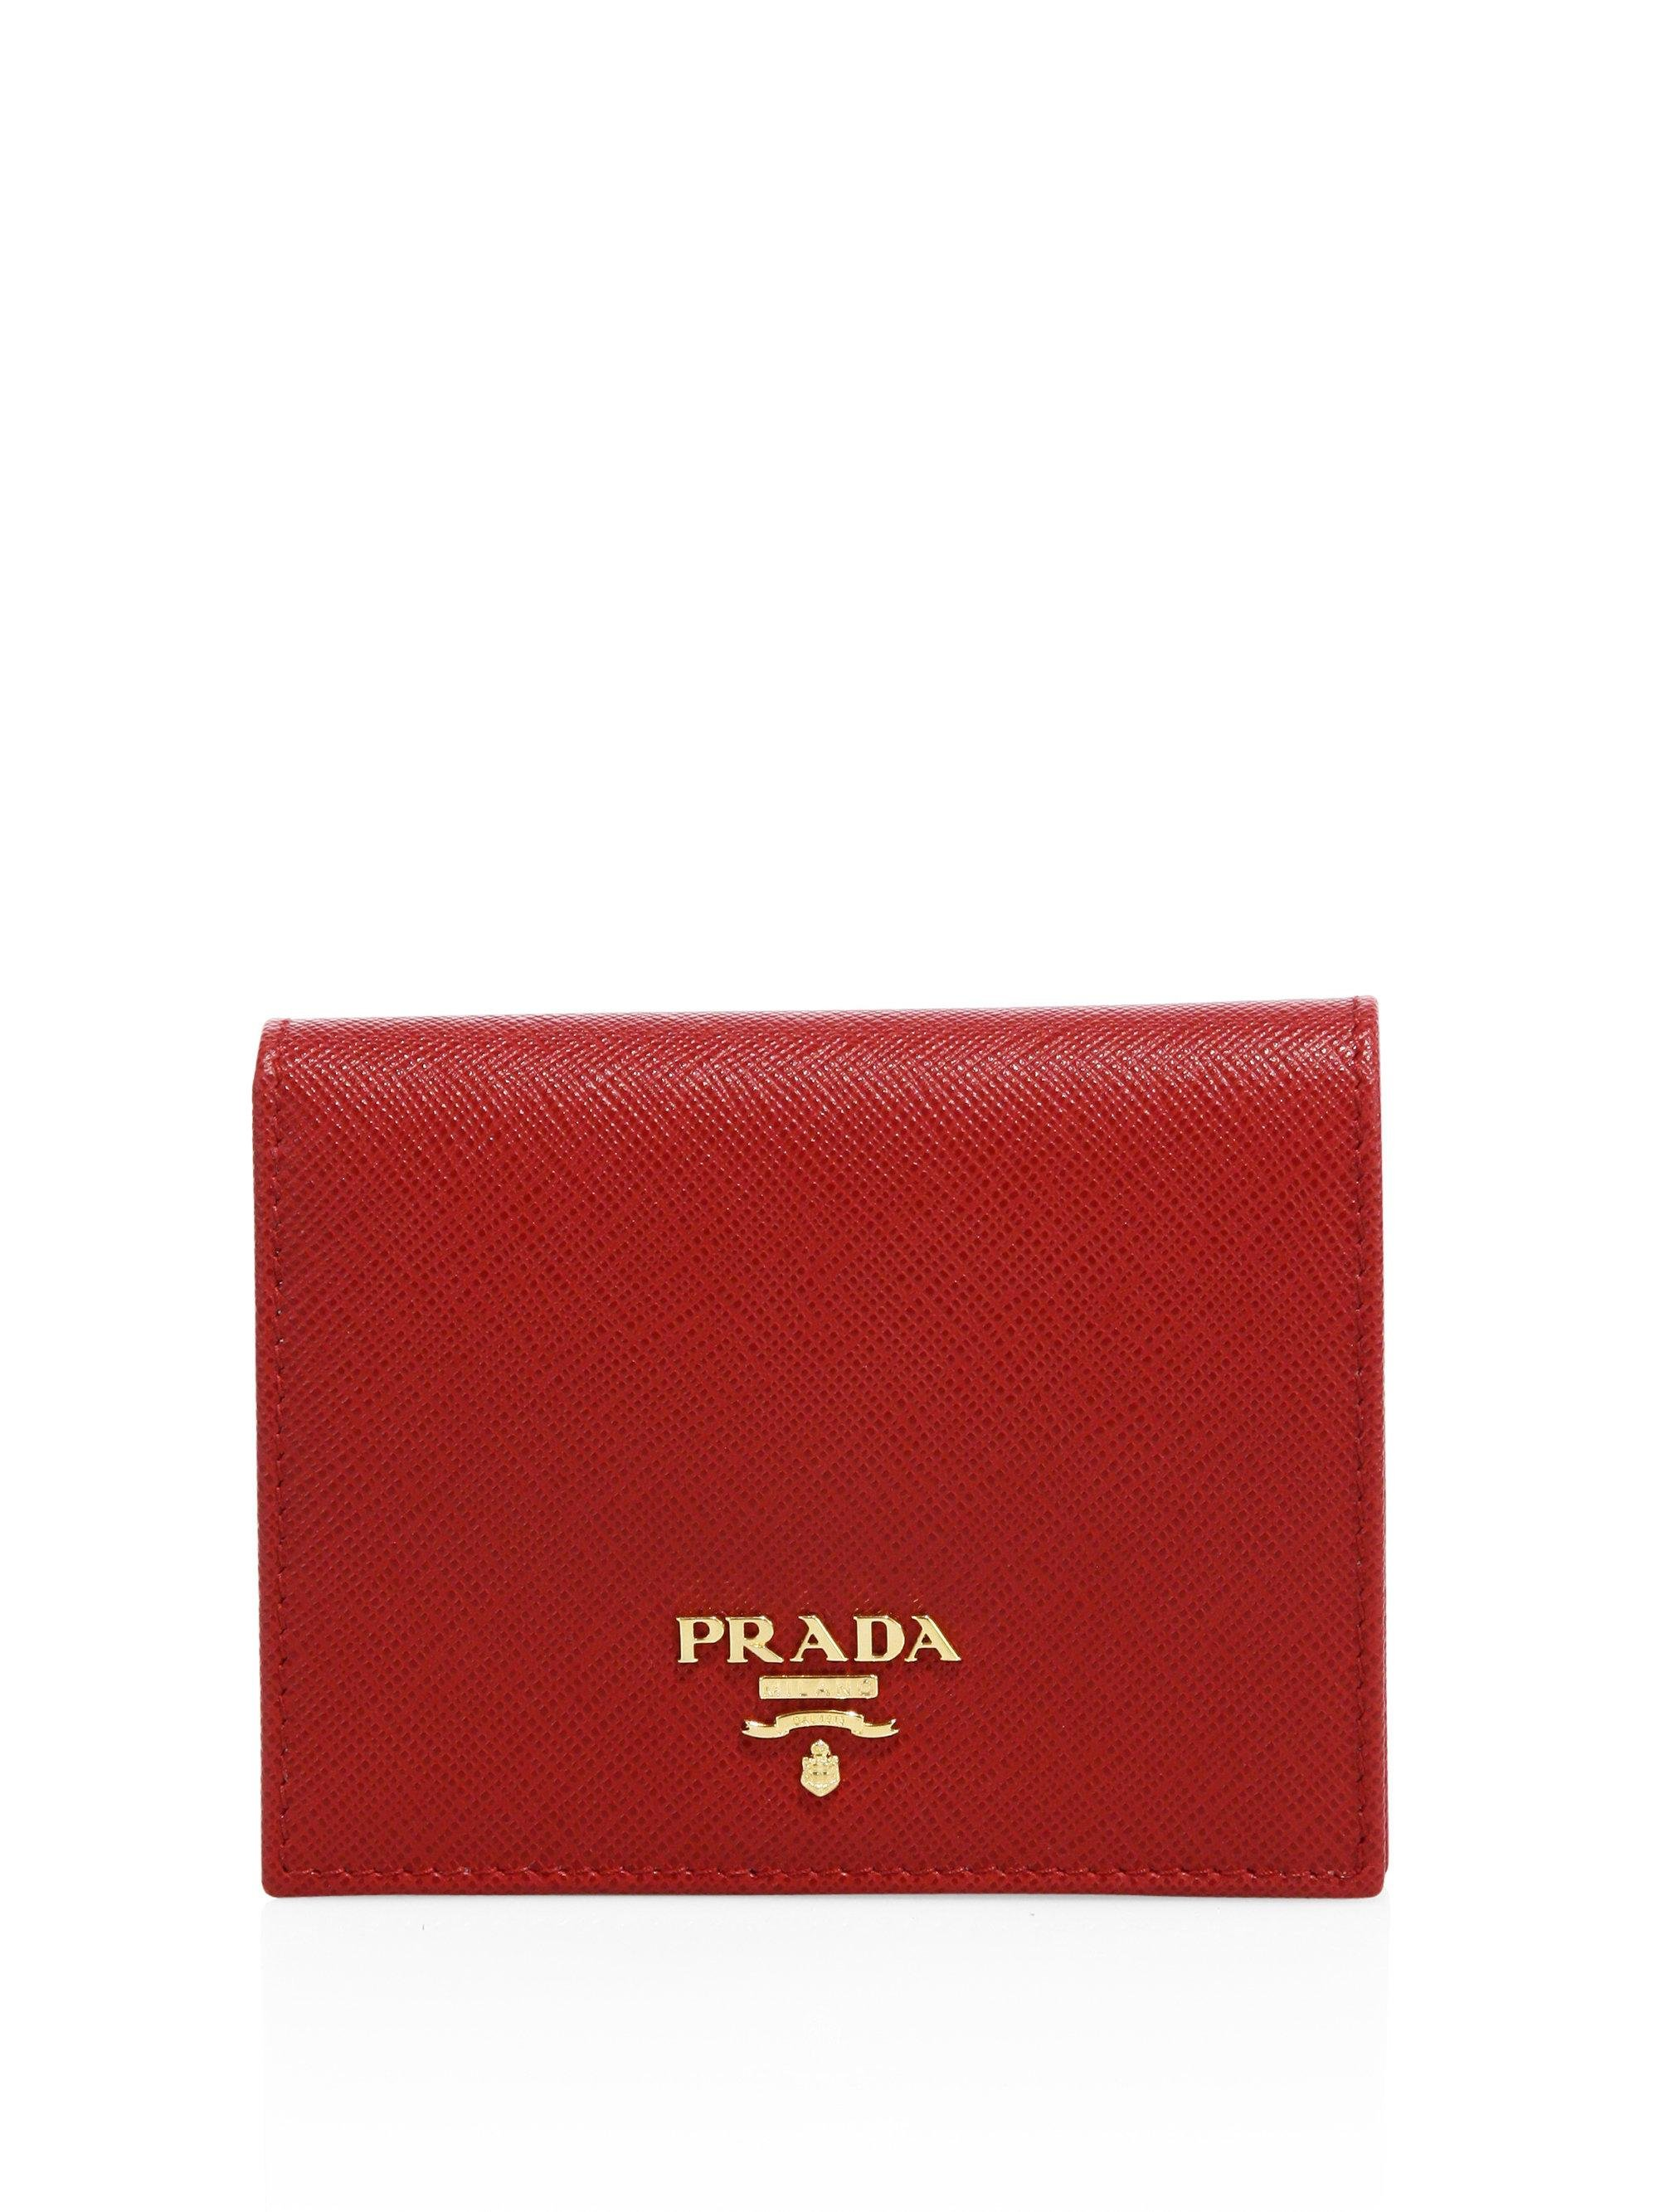 29bf16081f5f ... where to buy prada red mini saffiano leather bifold wallet lyst. view  fullscreen 37e4d b5104